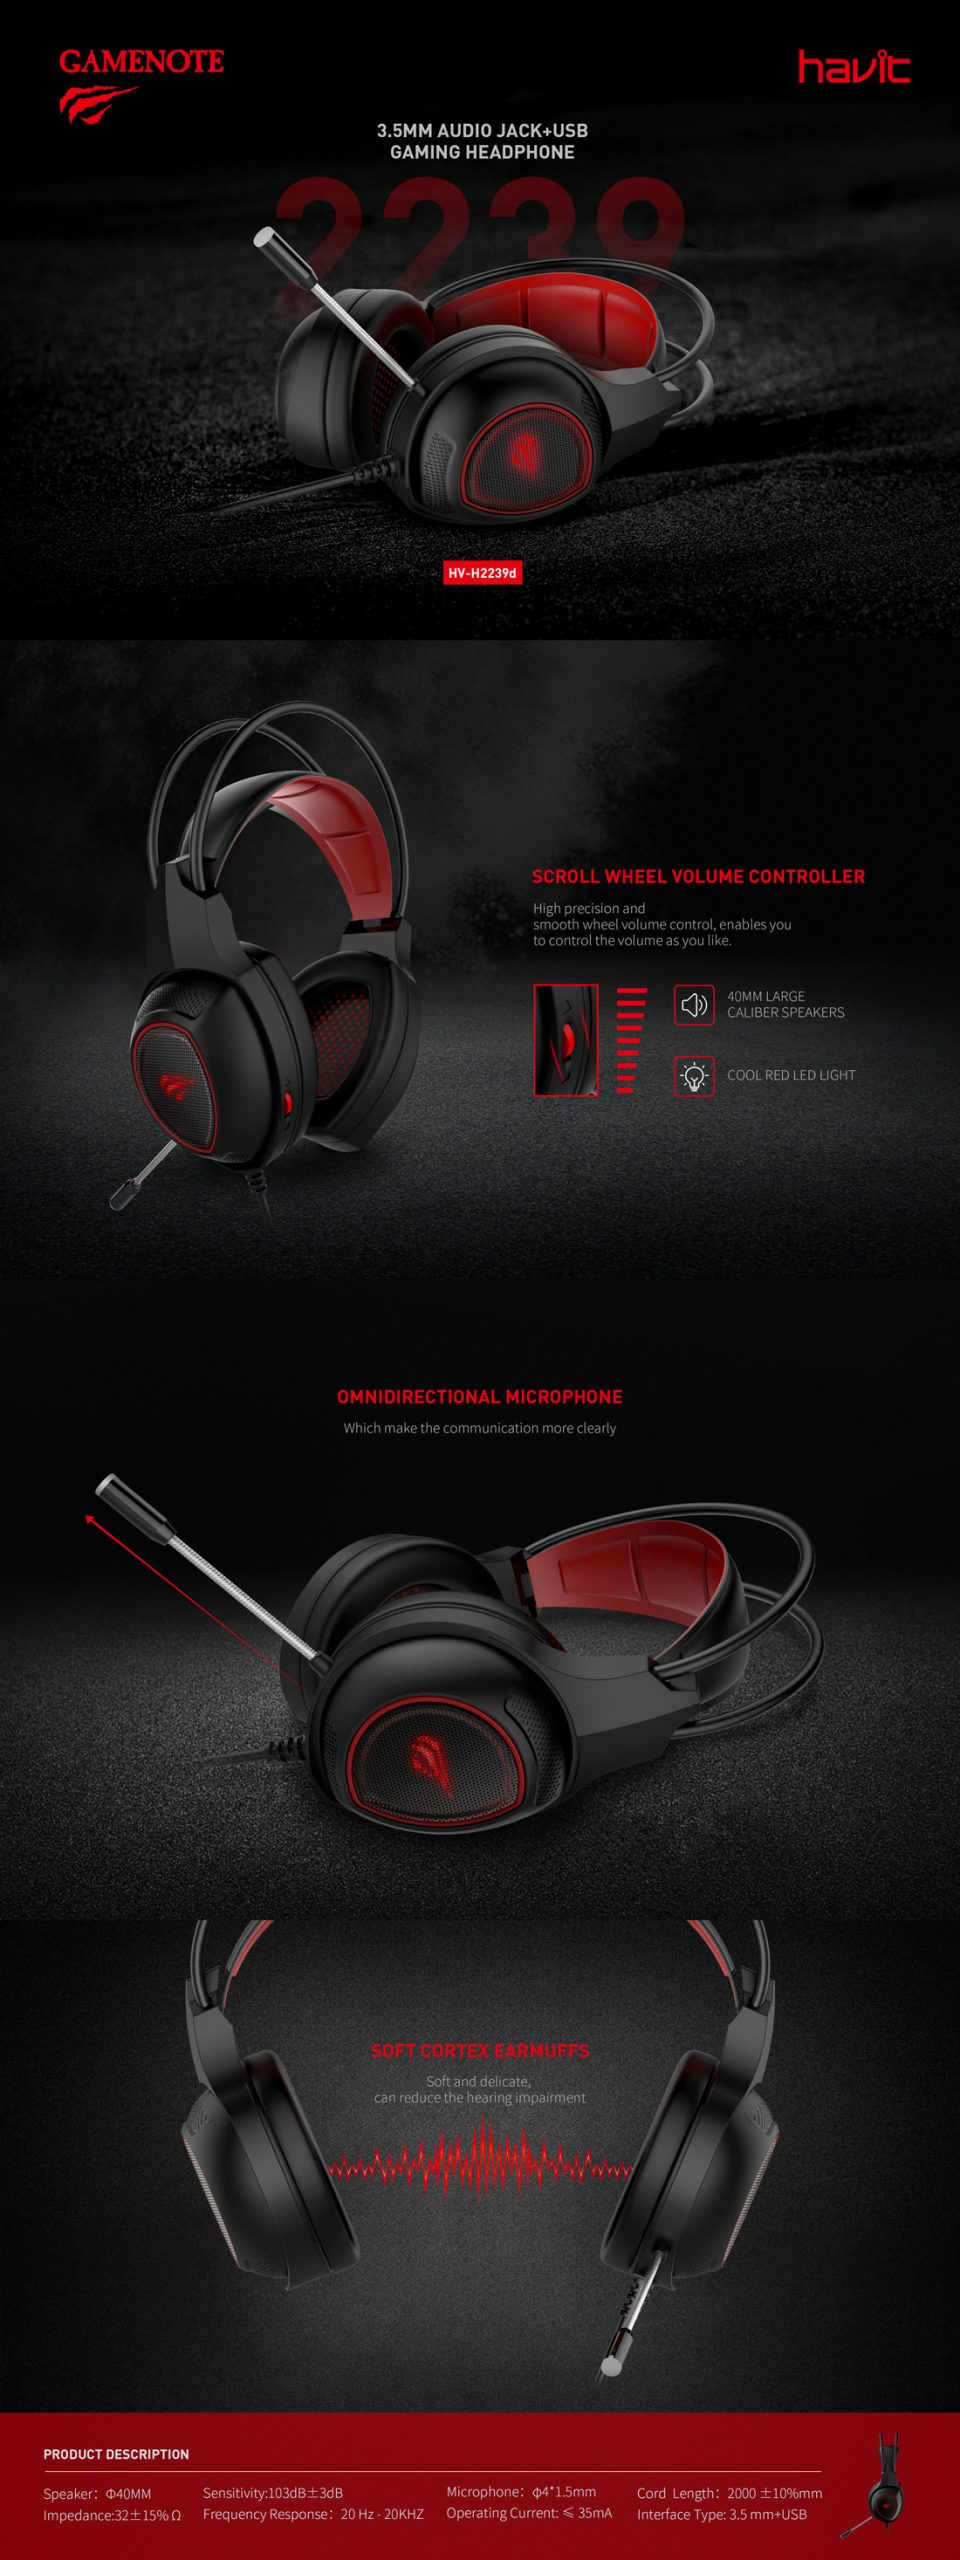 HV-H2239D 3.5mm + USB Gaming Headphone